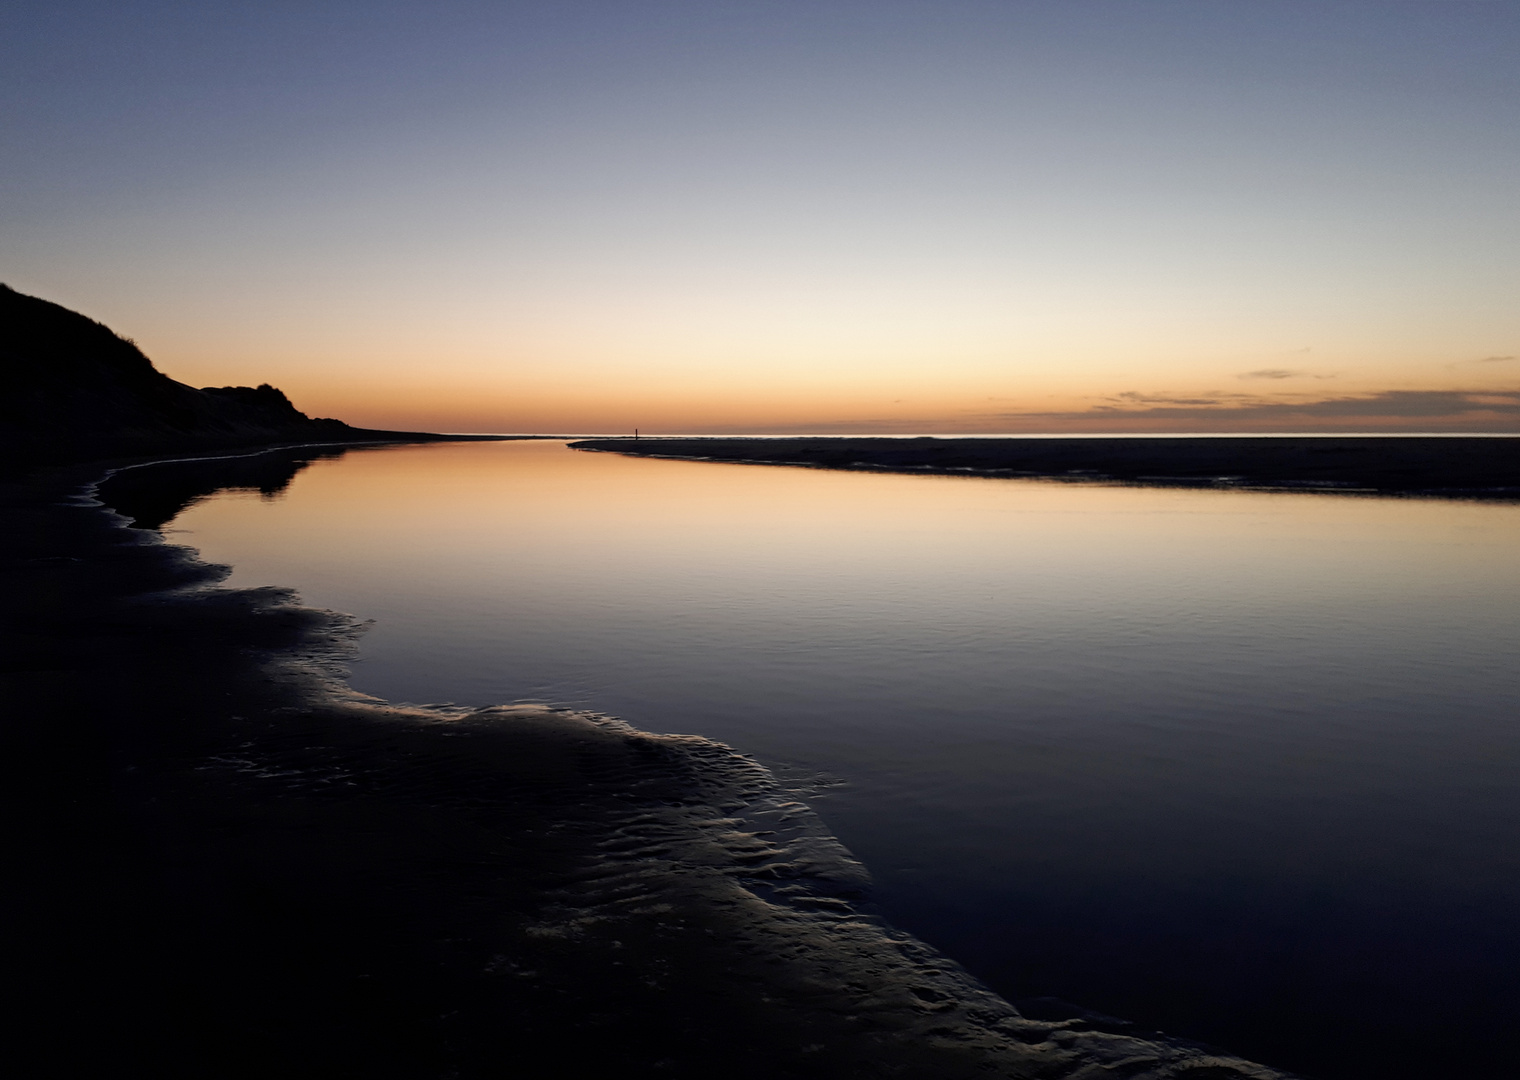 Sonnenuntergang am Slufter